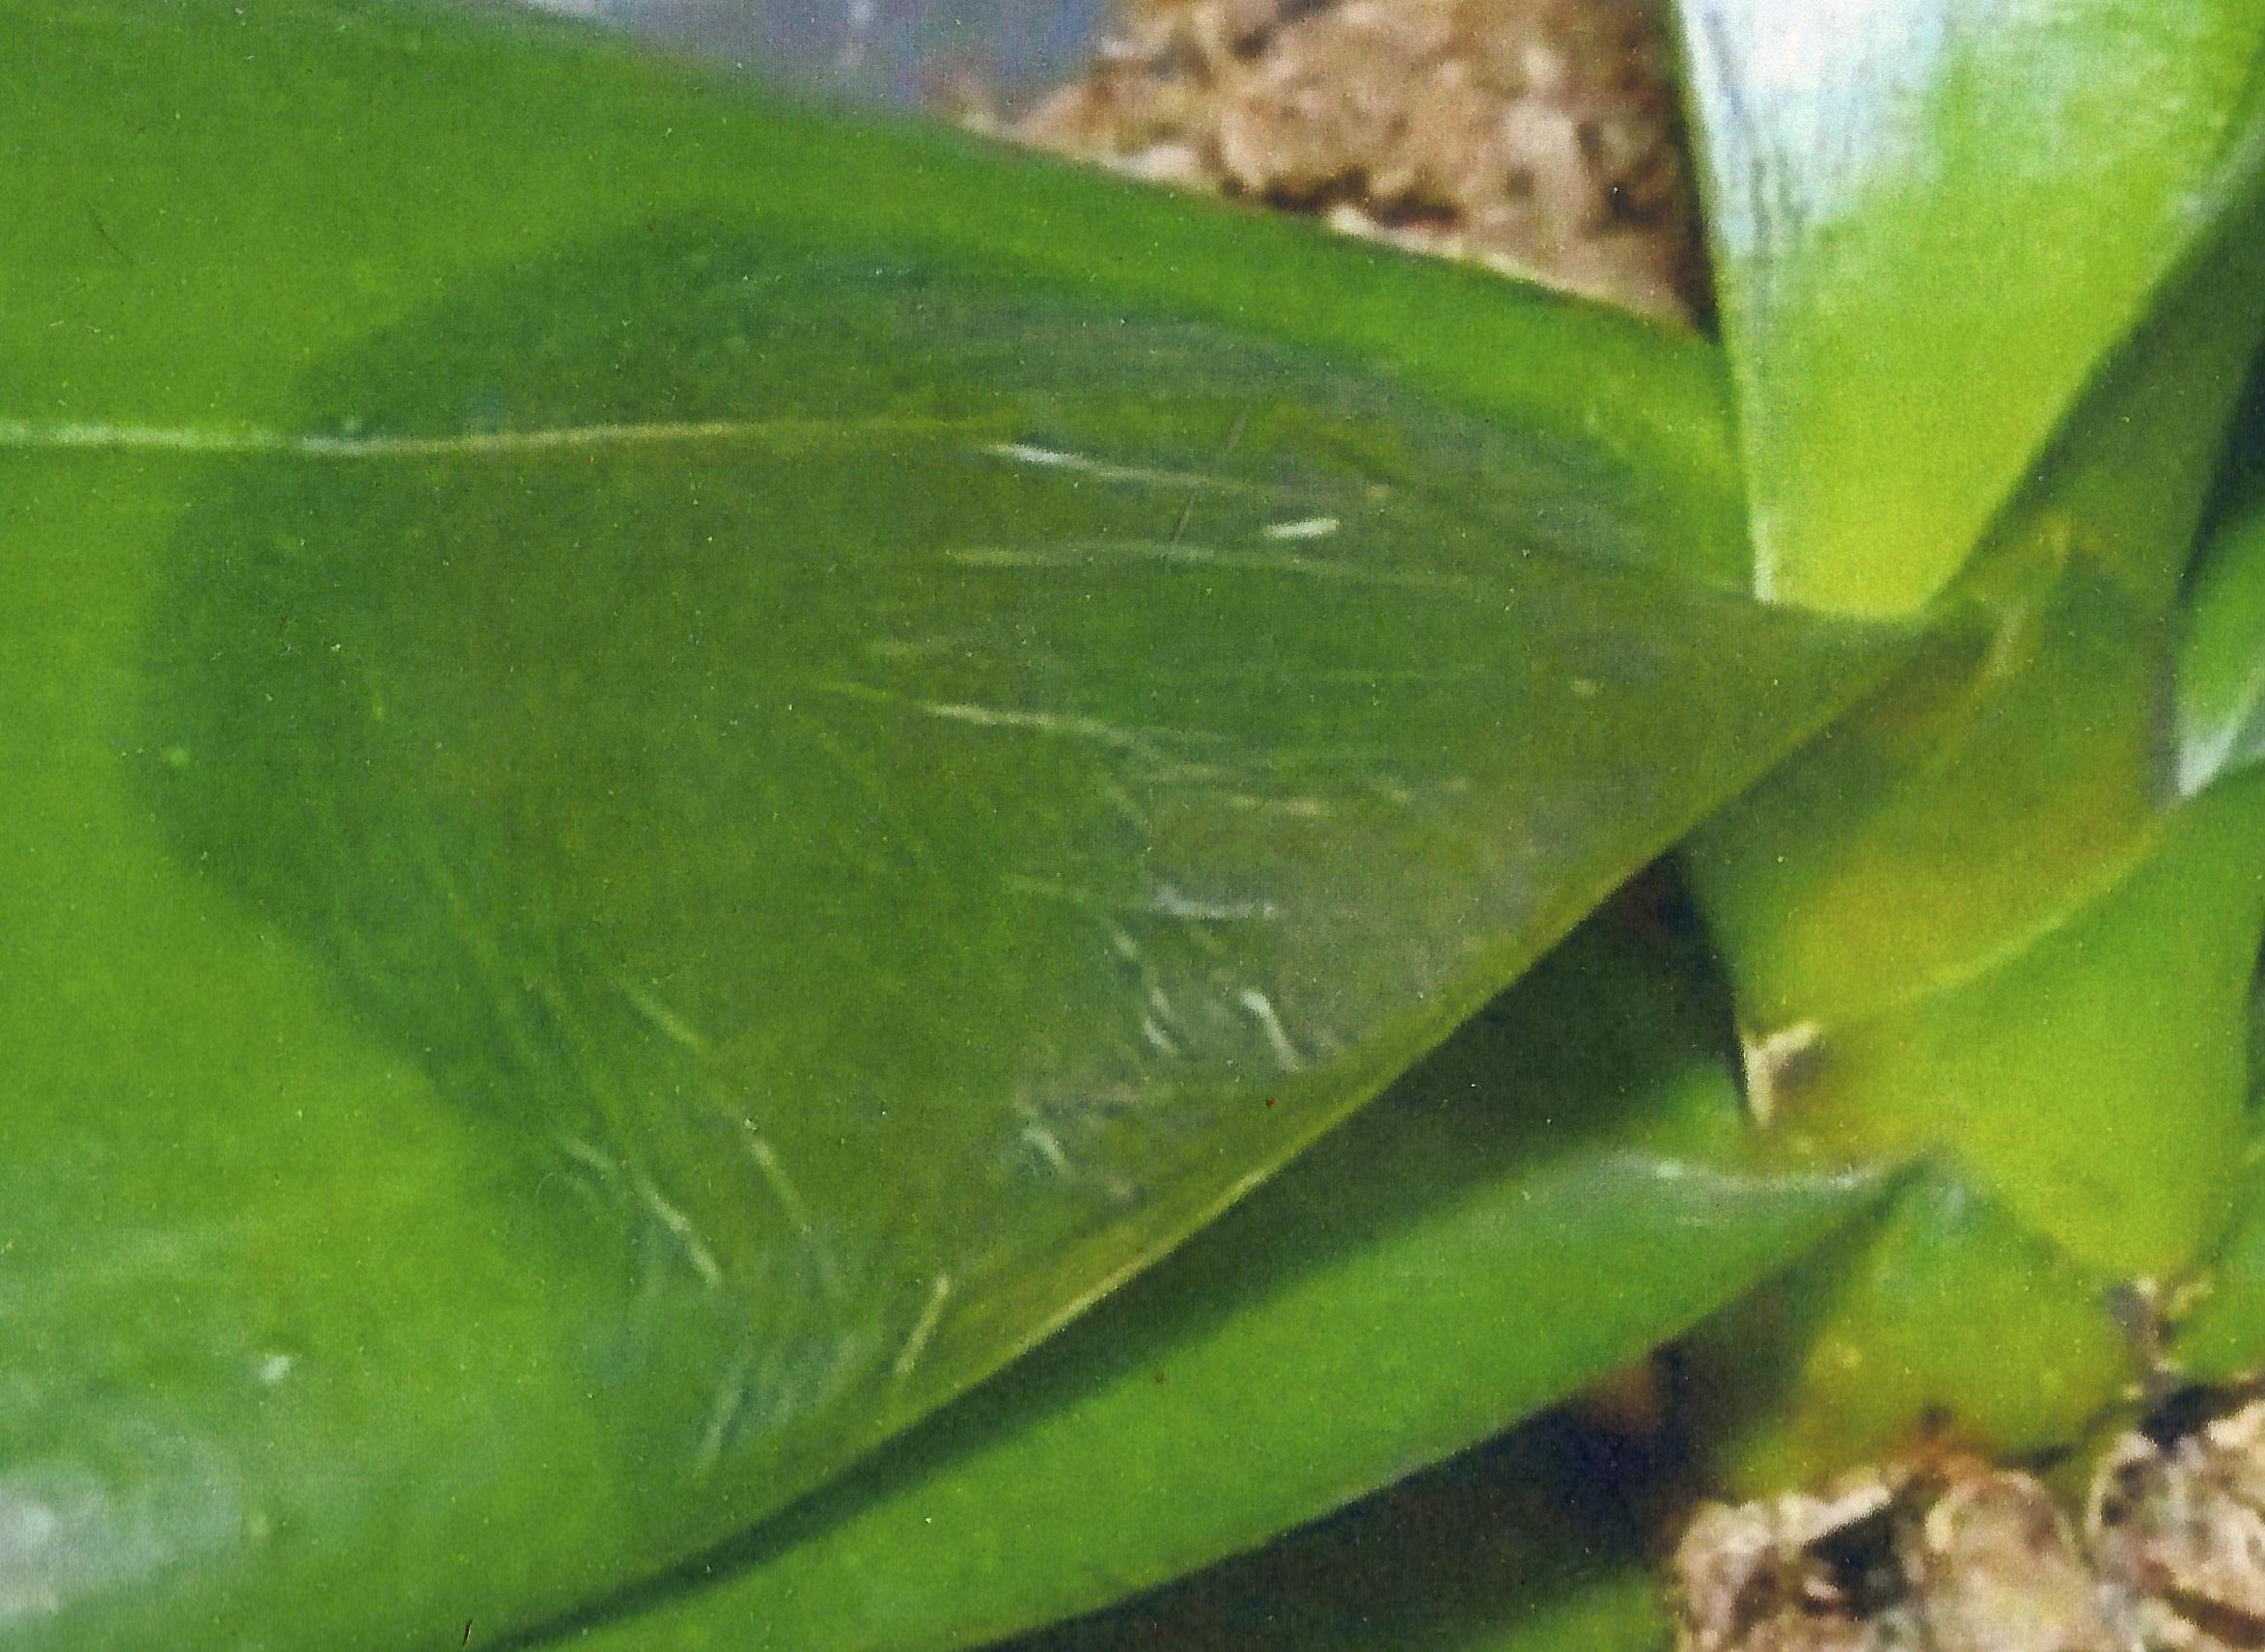 Мокрые пятна на листьях фаленопсиса